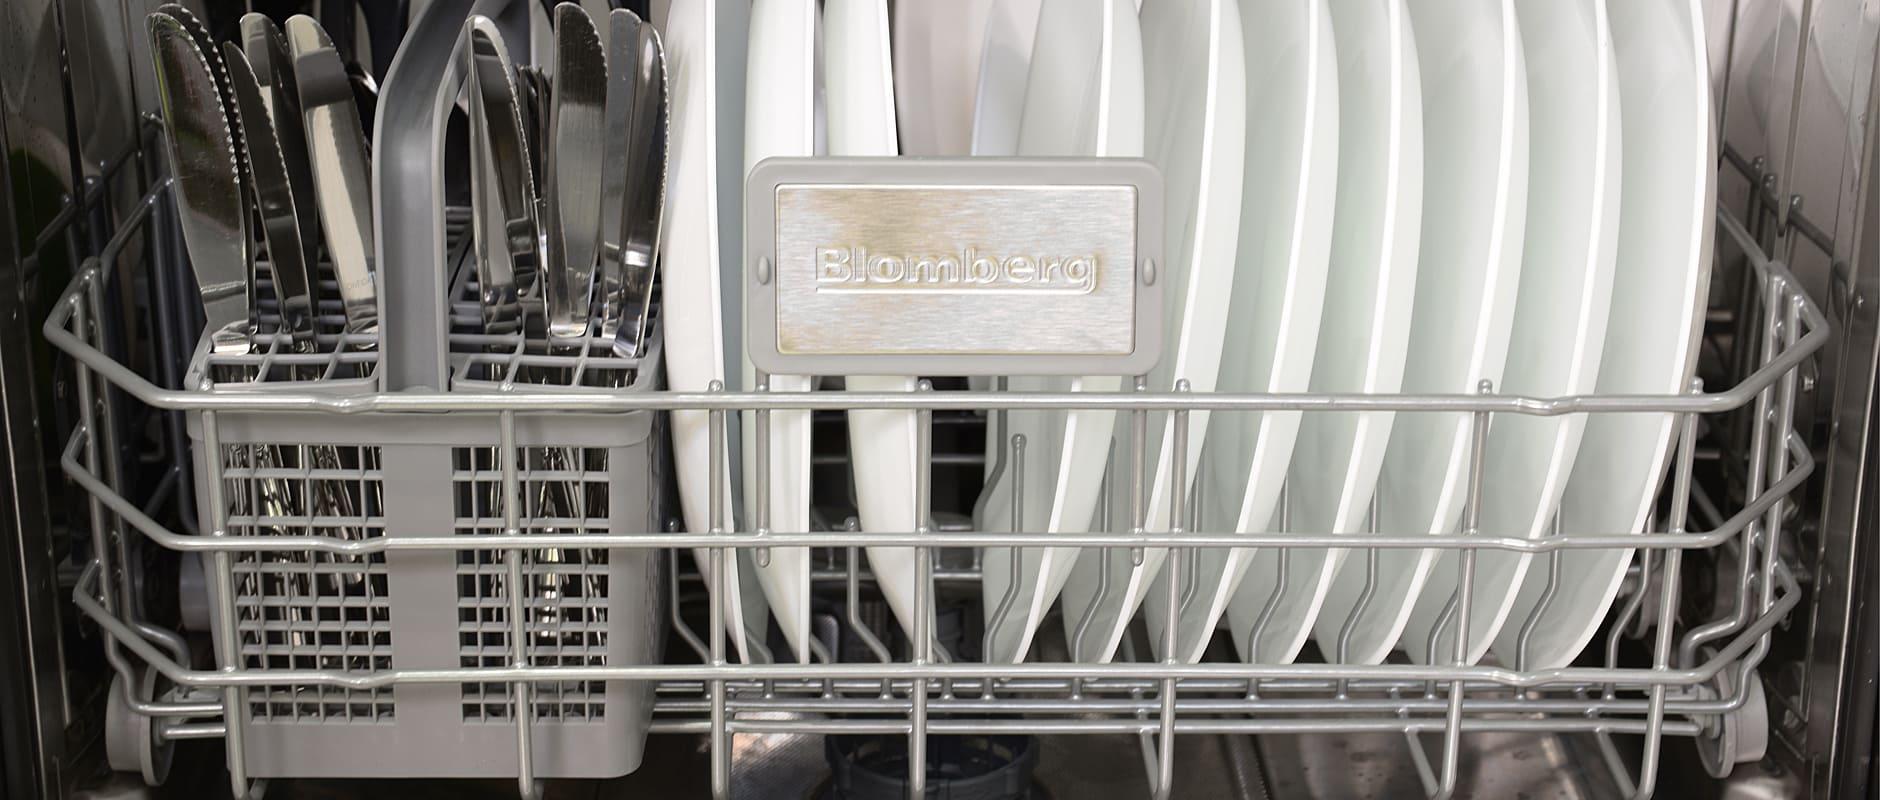 Blomberg DWT57500SS